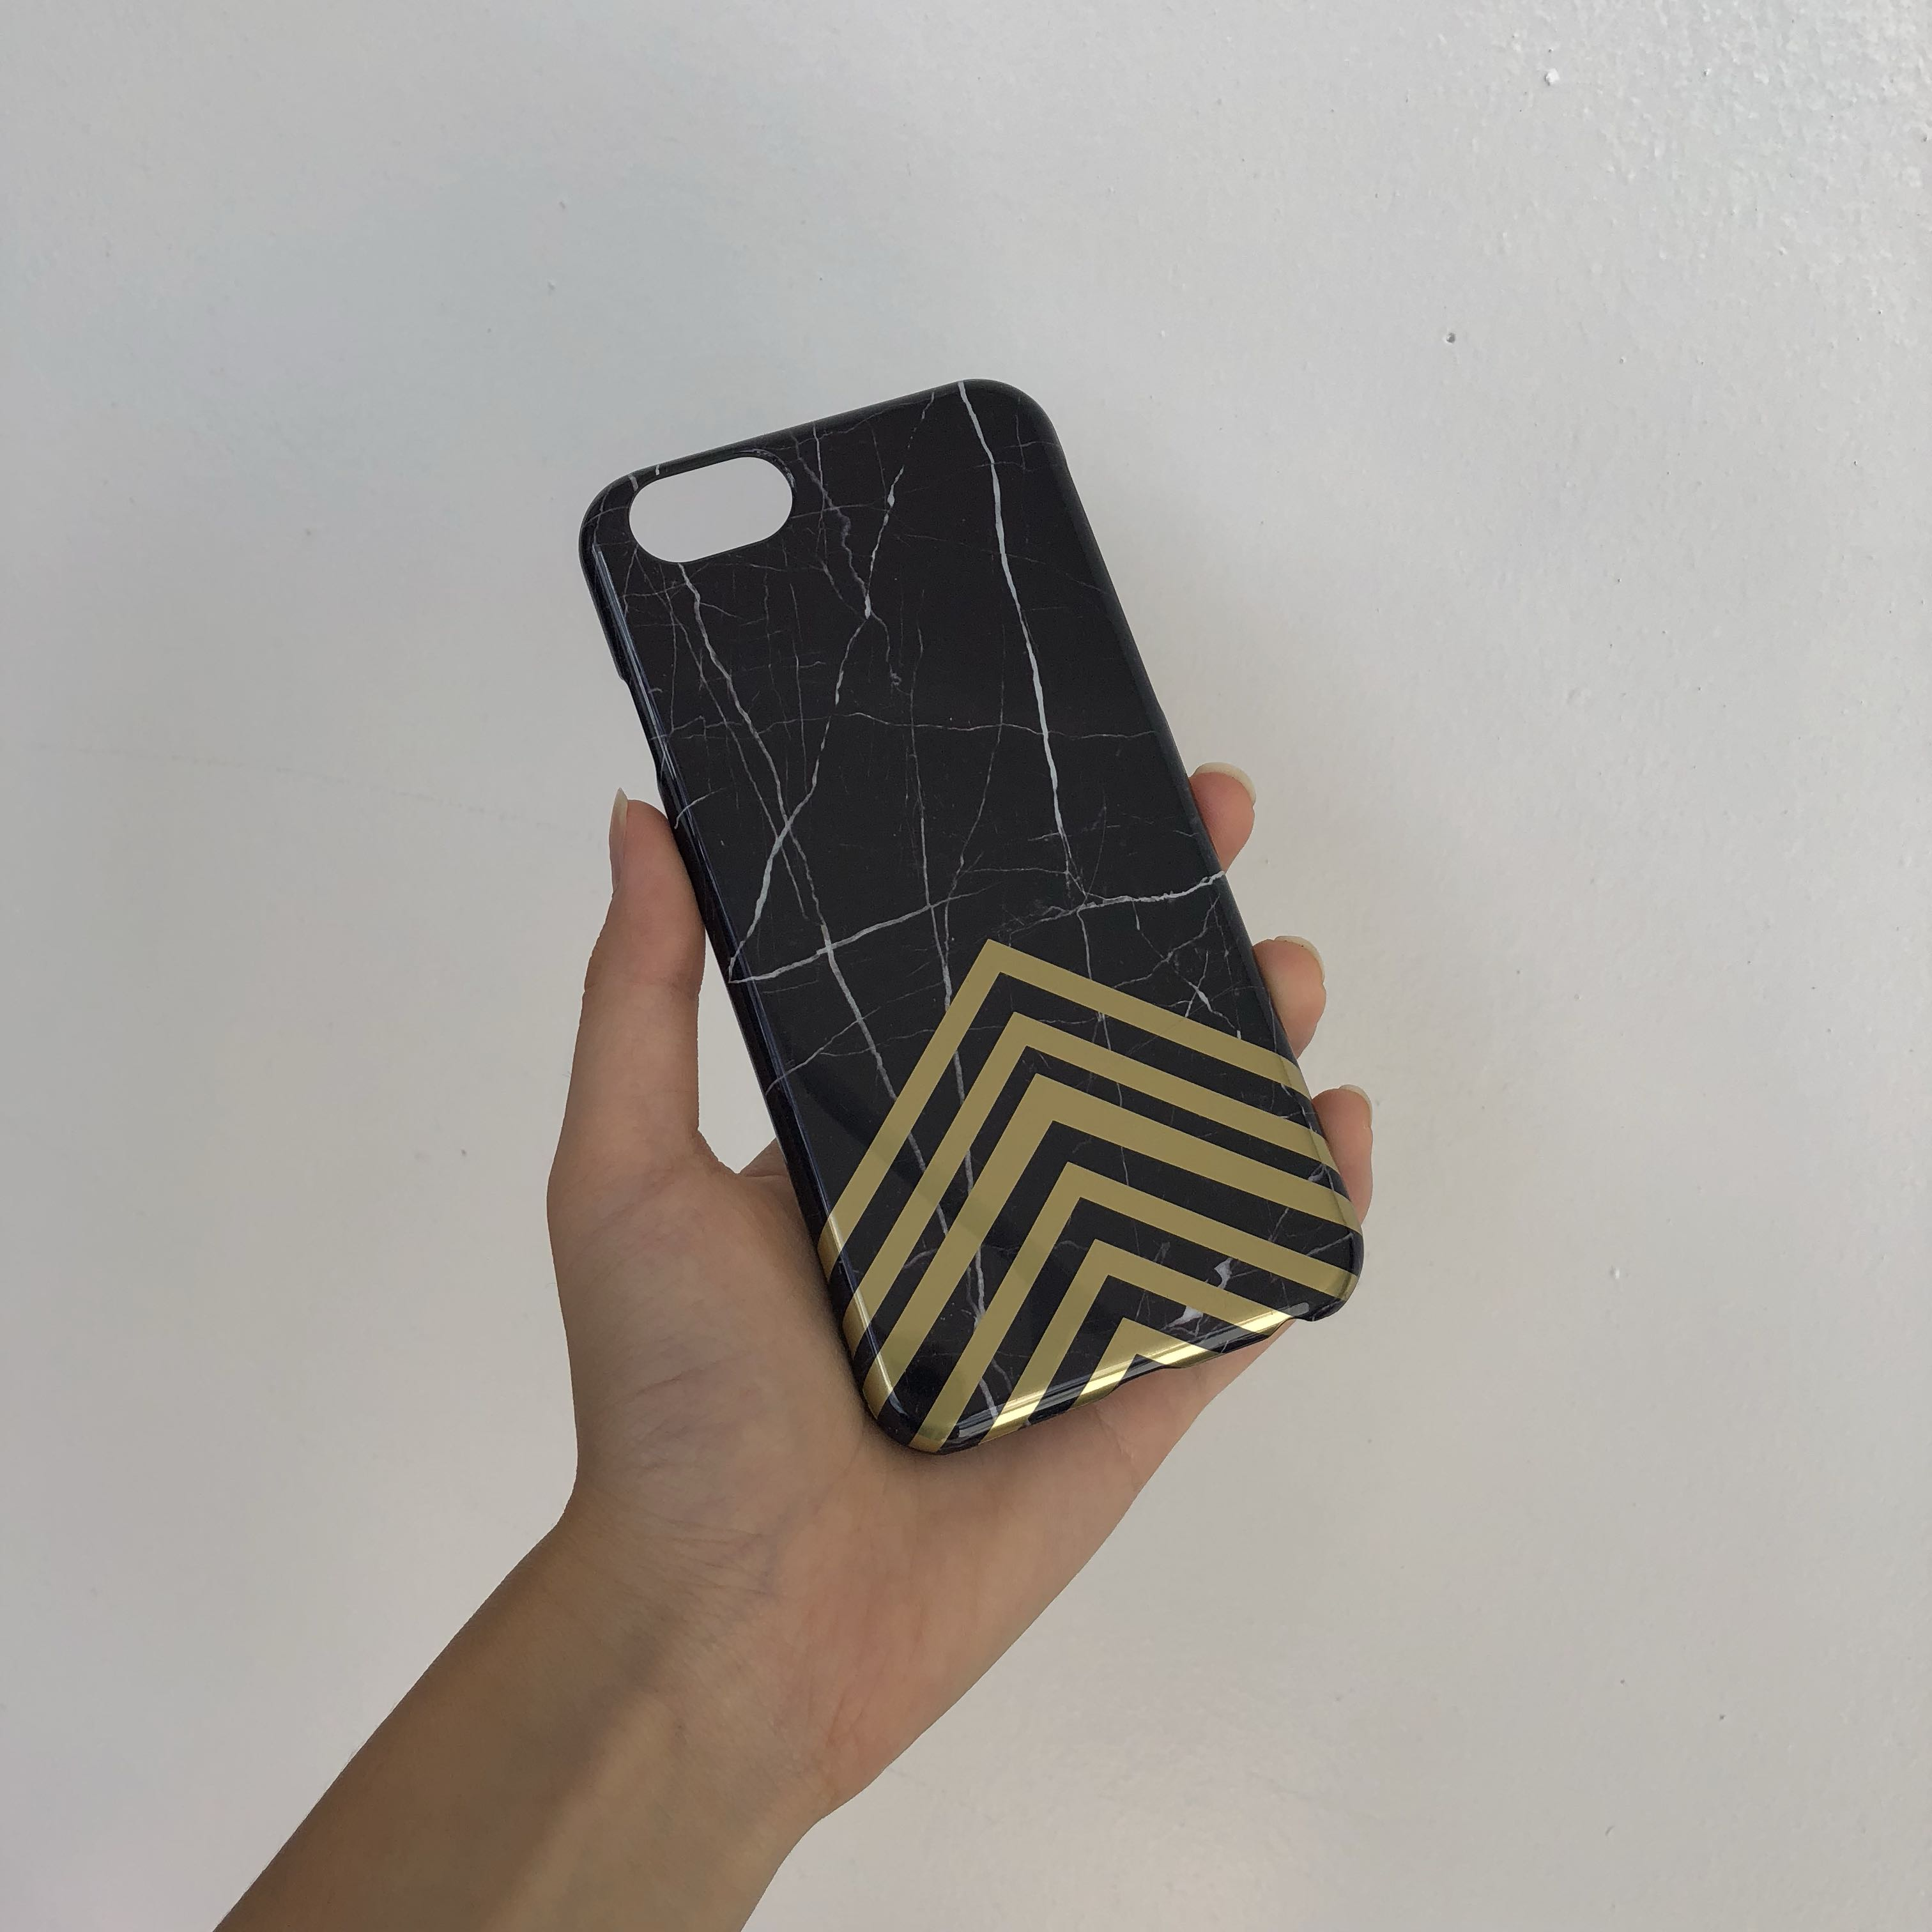 iPhone 6 black marble case